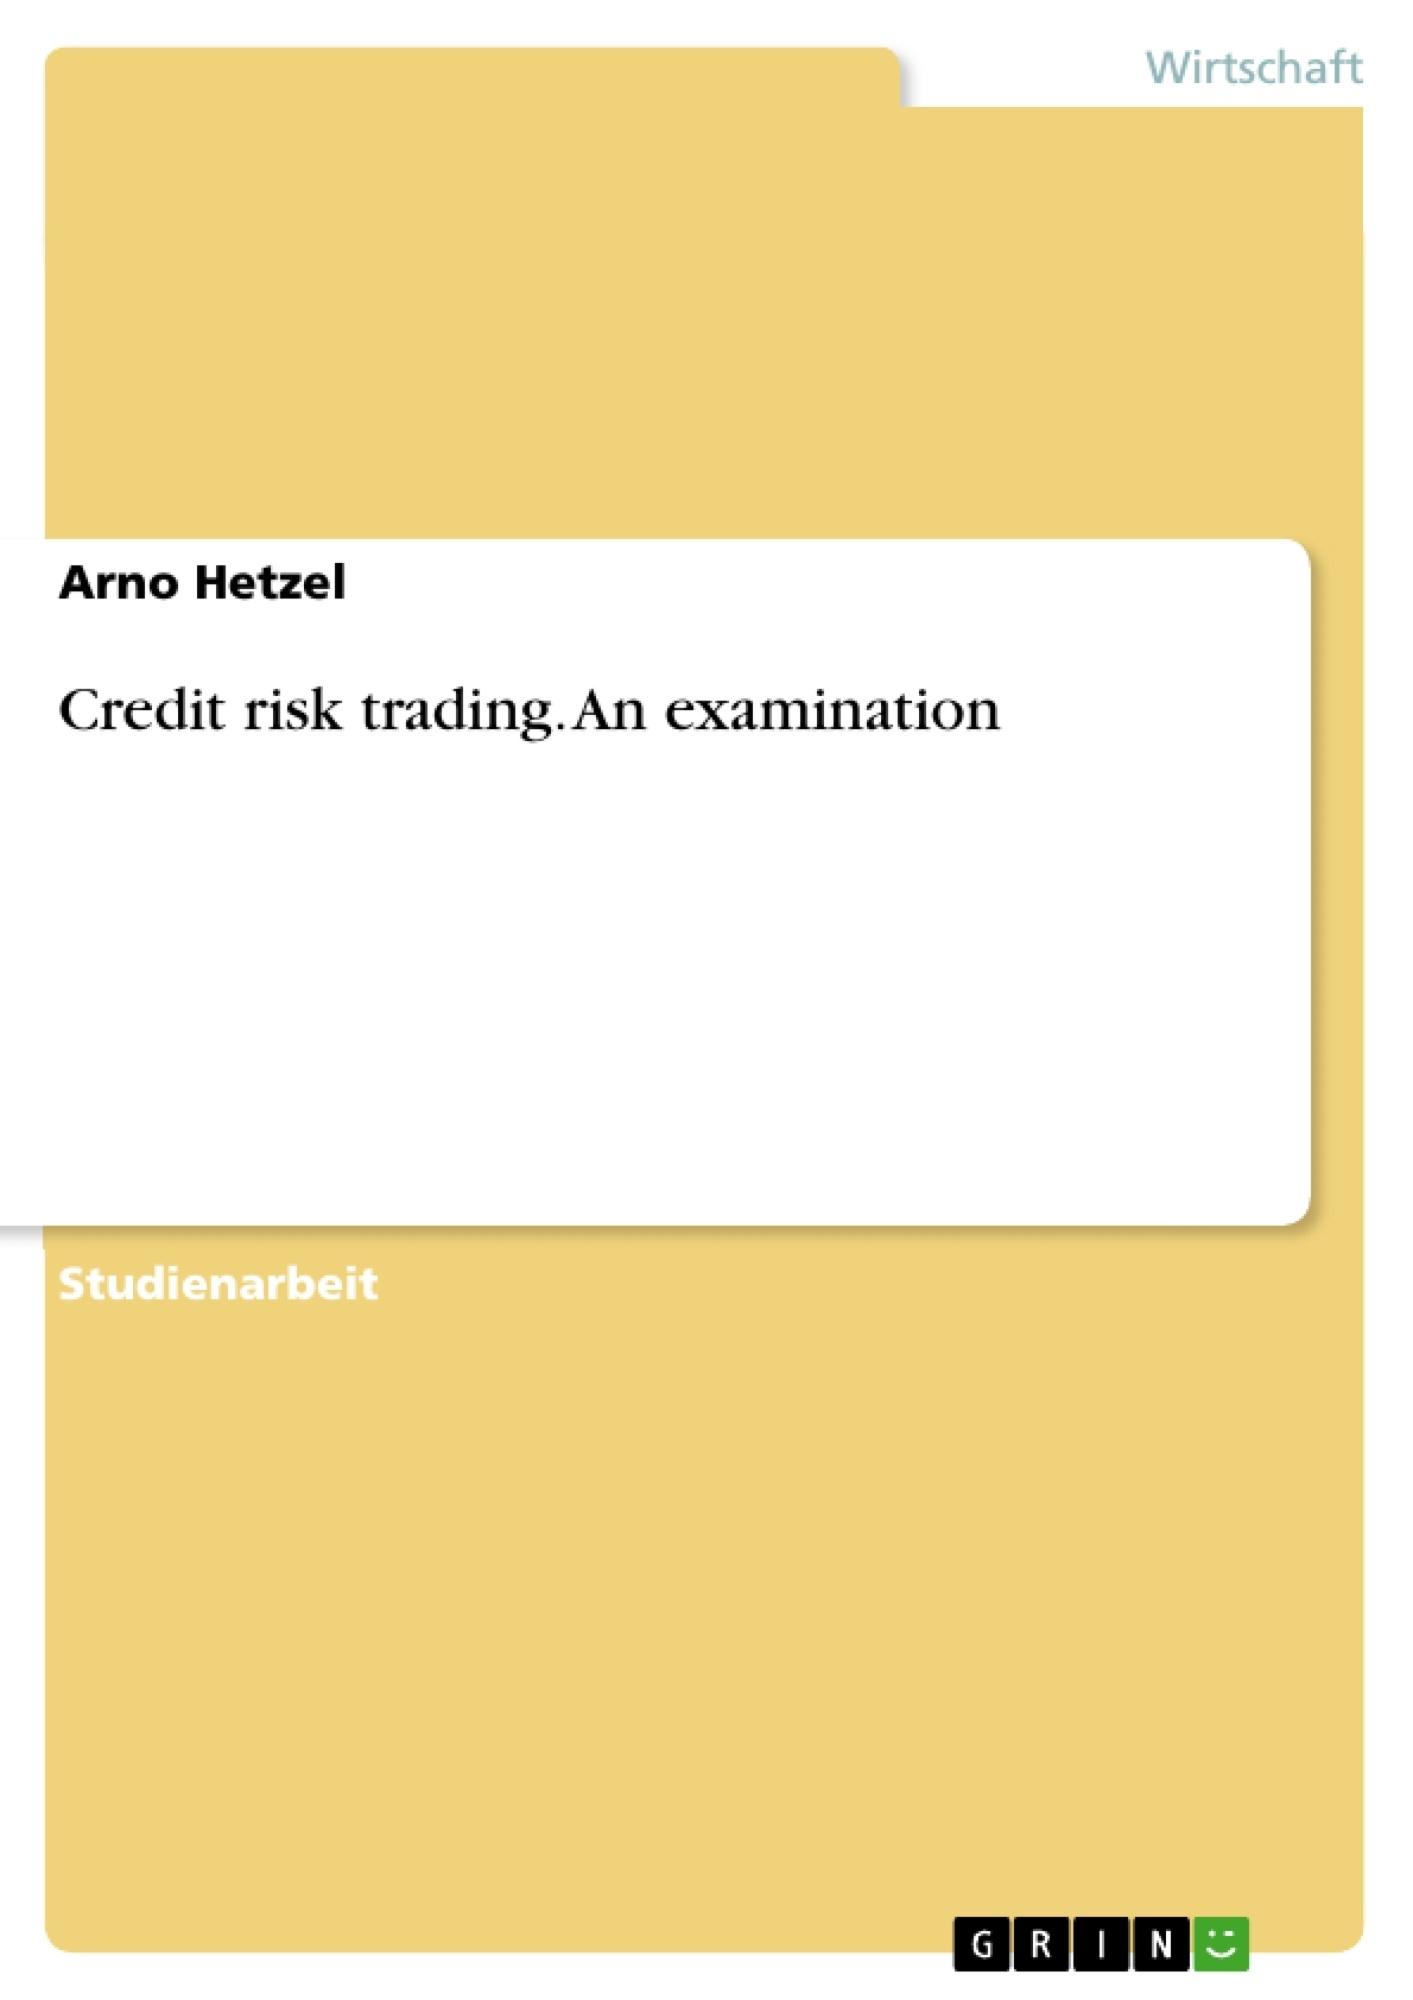 Titel: Credit risk trading. An examination